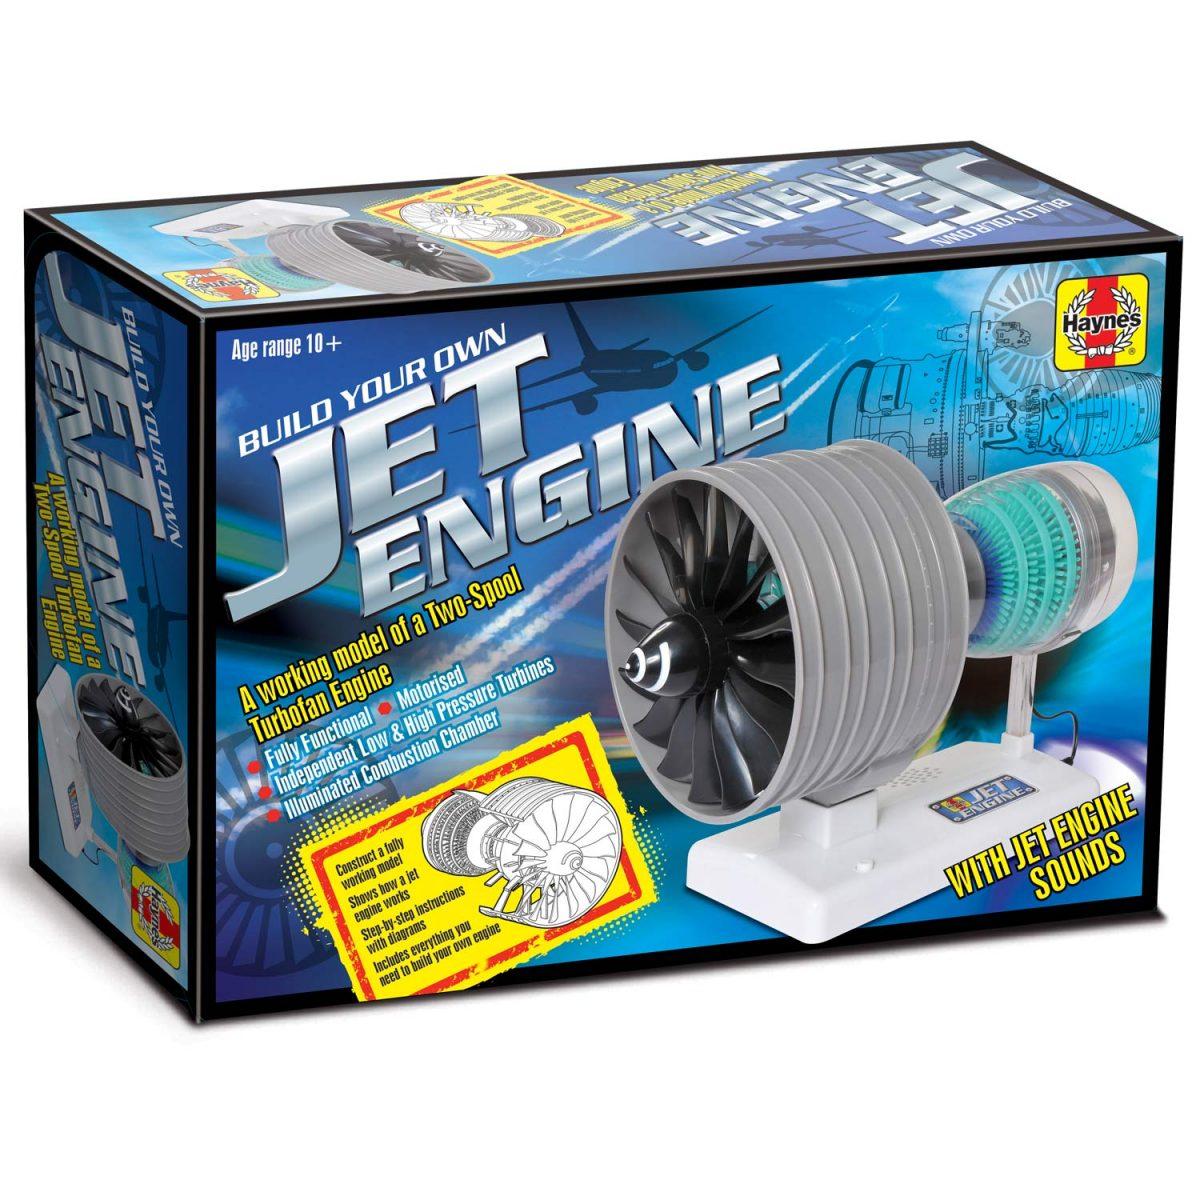 Haynes Jet Engine Two Spool Turbo Fan (4M-HMJE01) Image 2